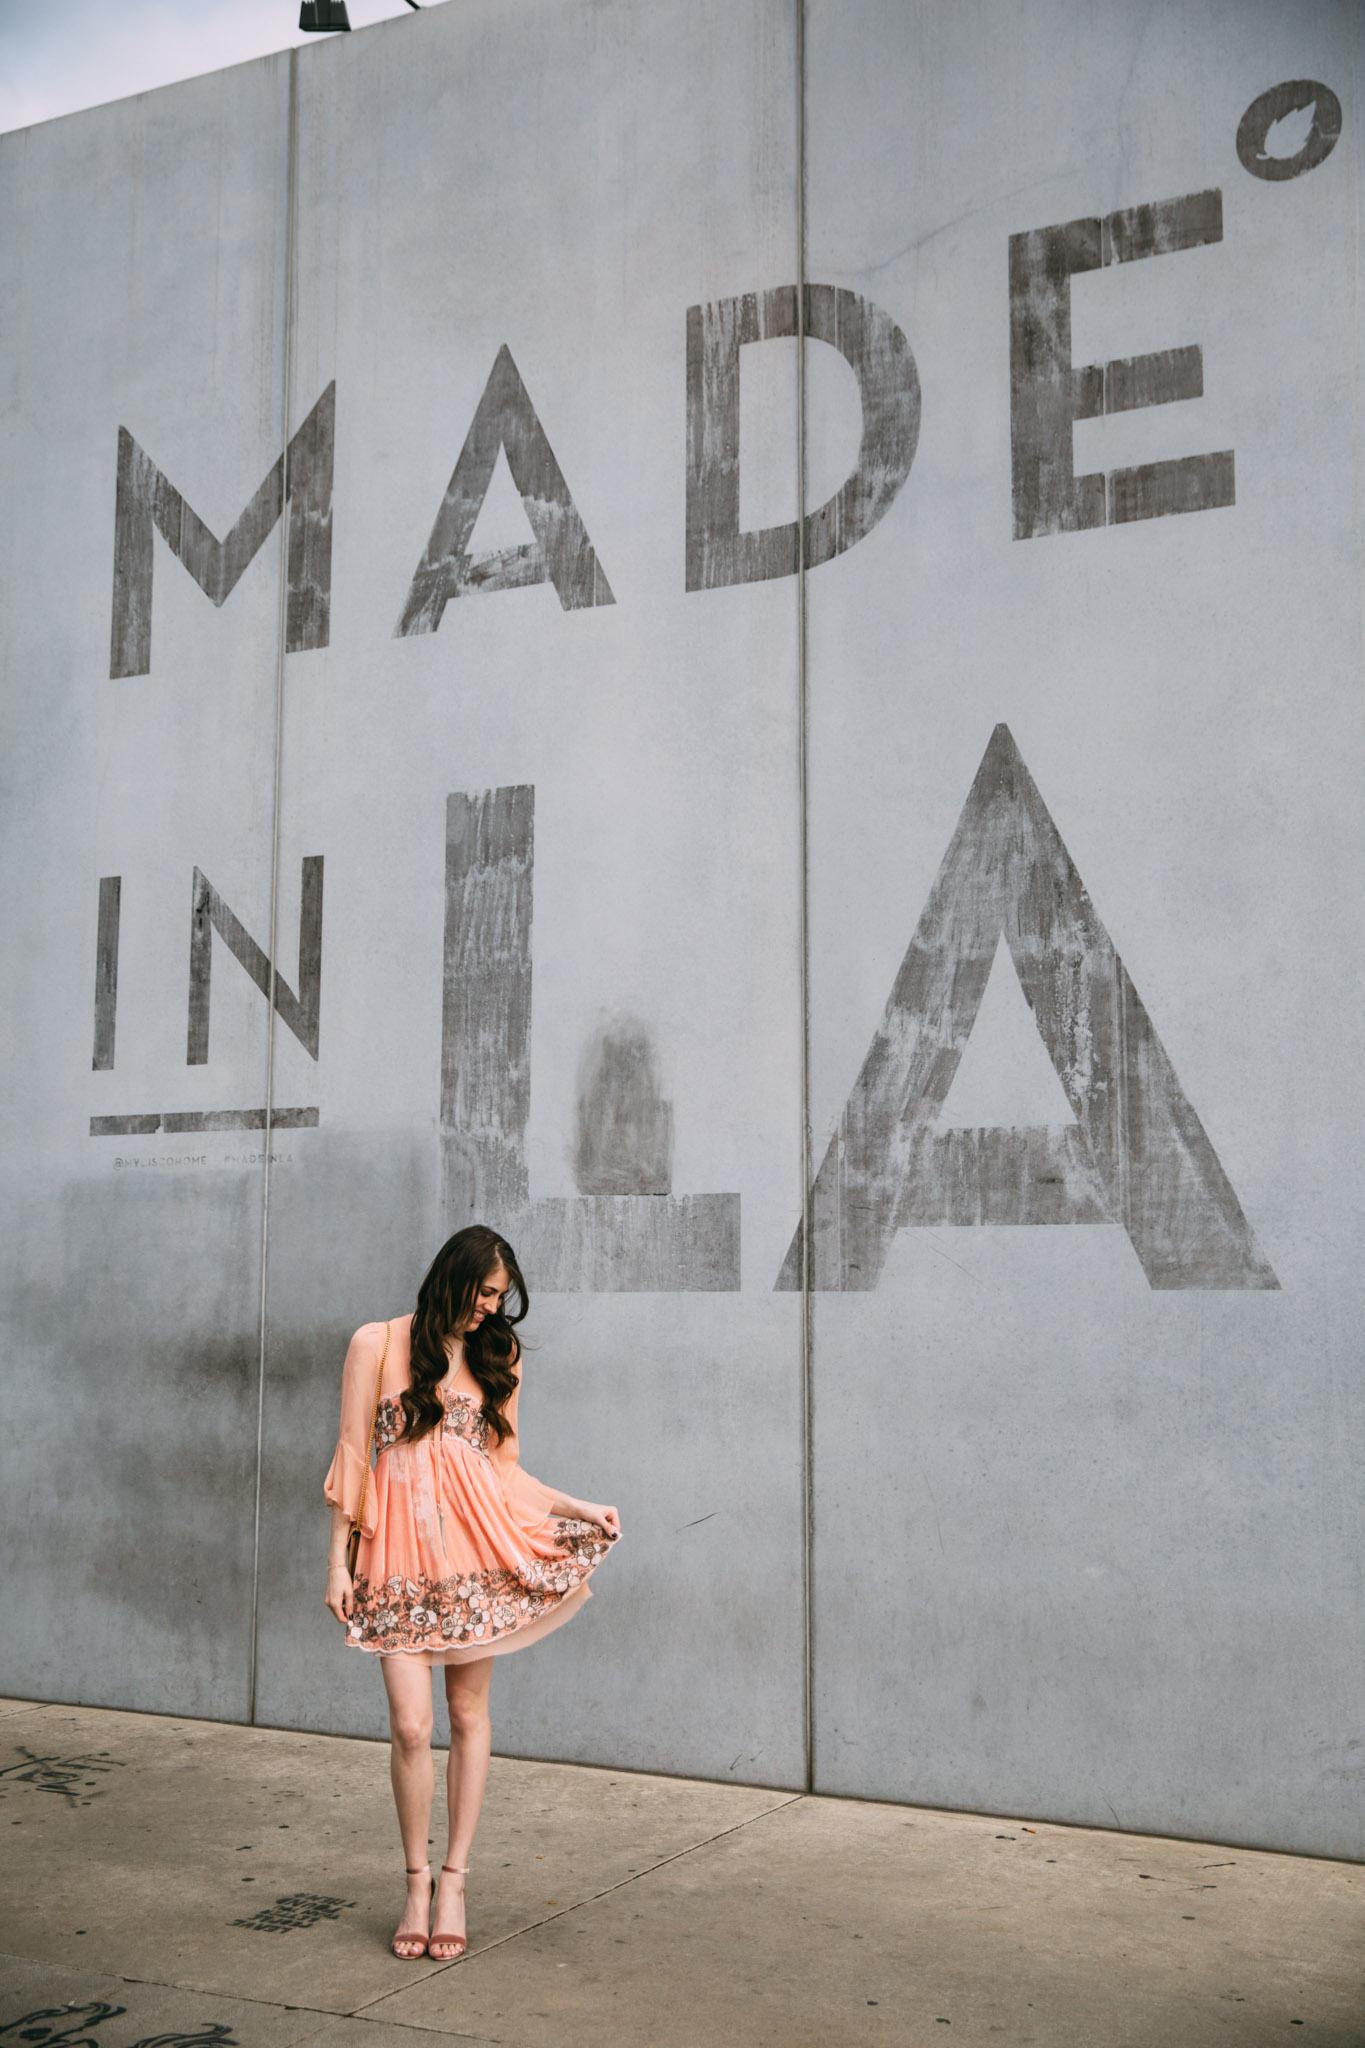 Made in LA wall Los Angeles